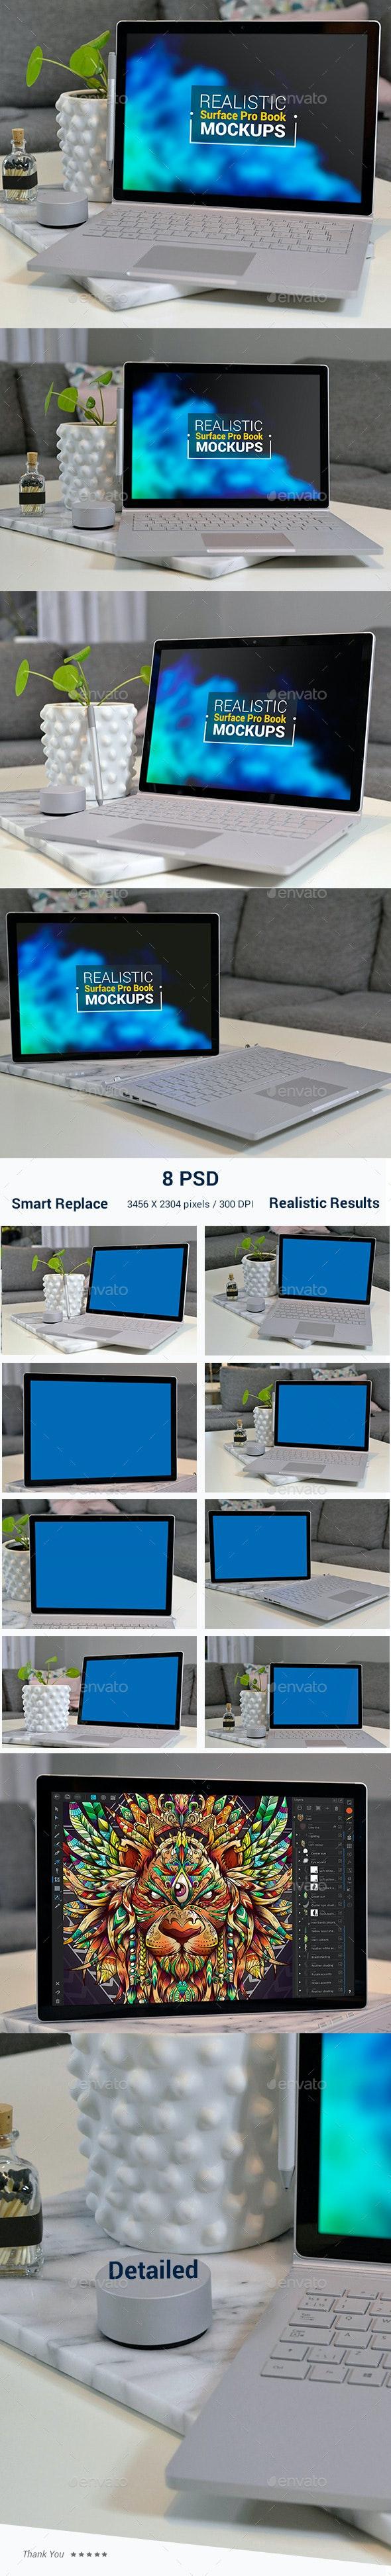 Surface Book Pro Realistic Mockups - Laptop Displays